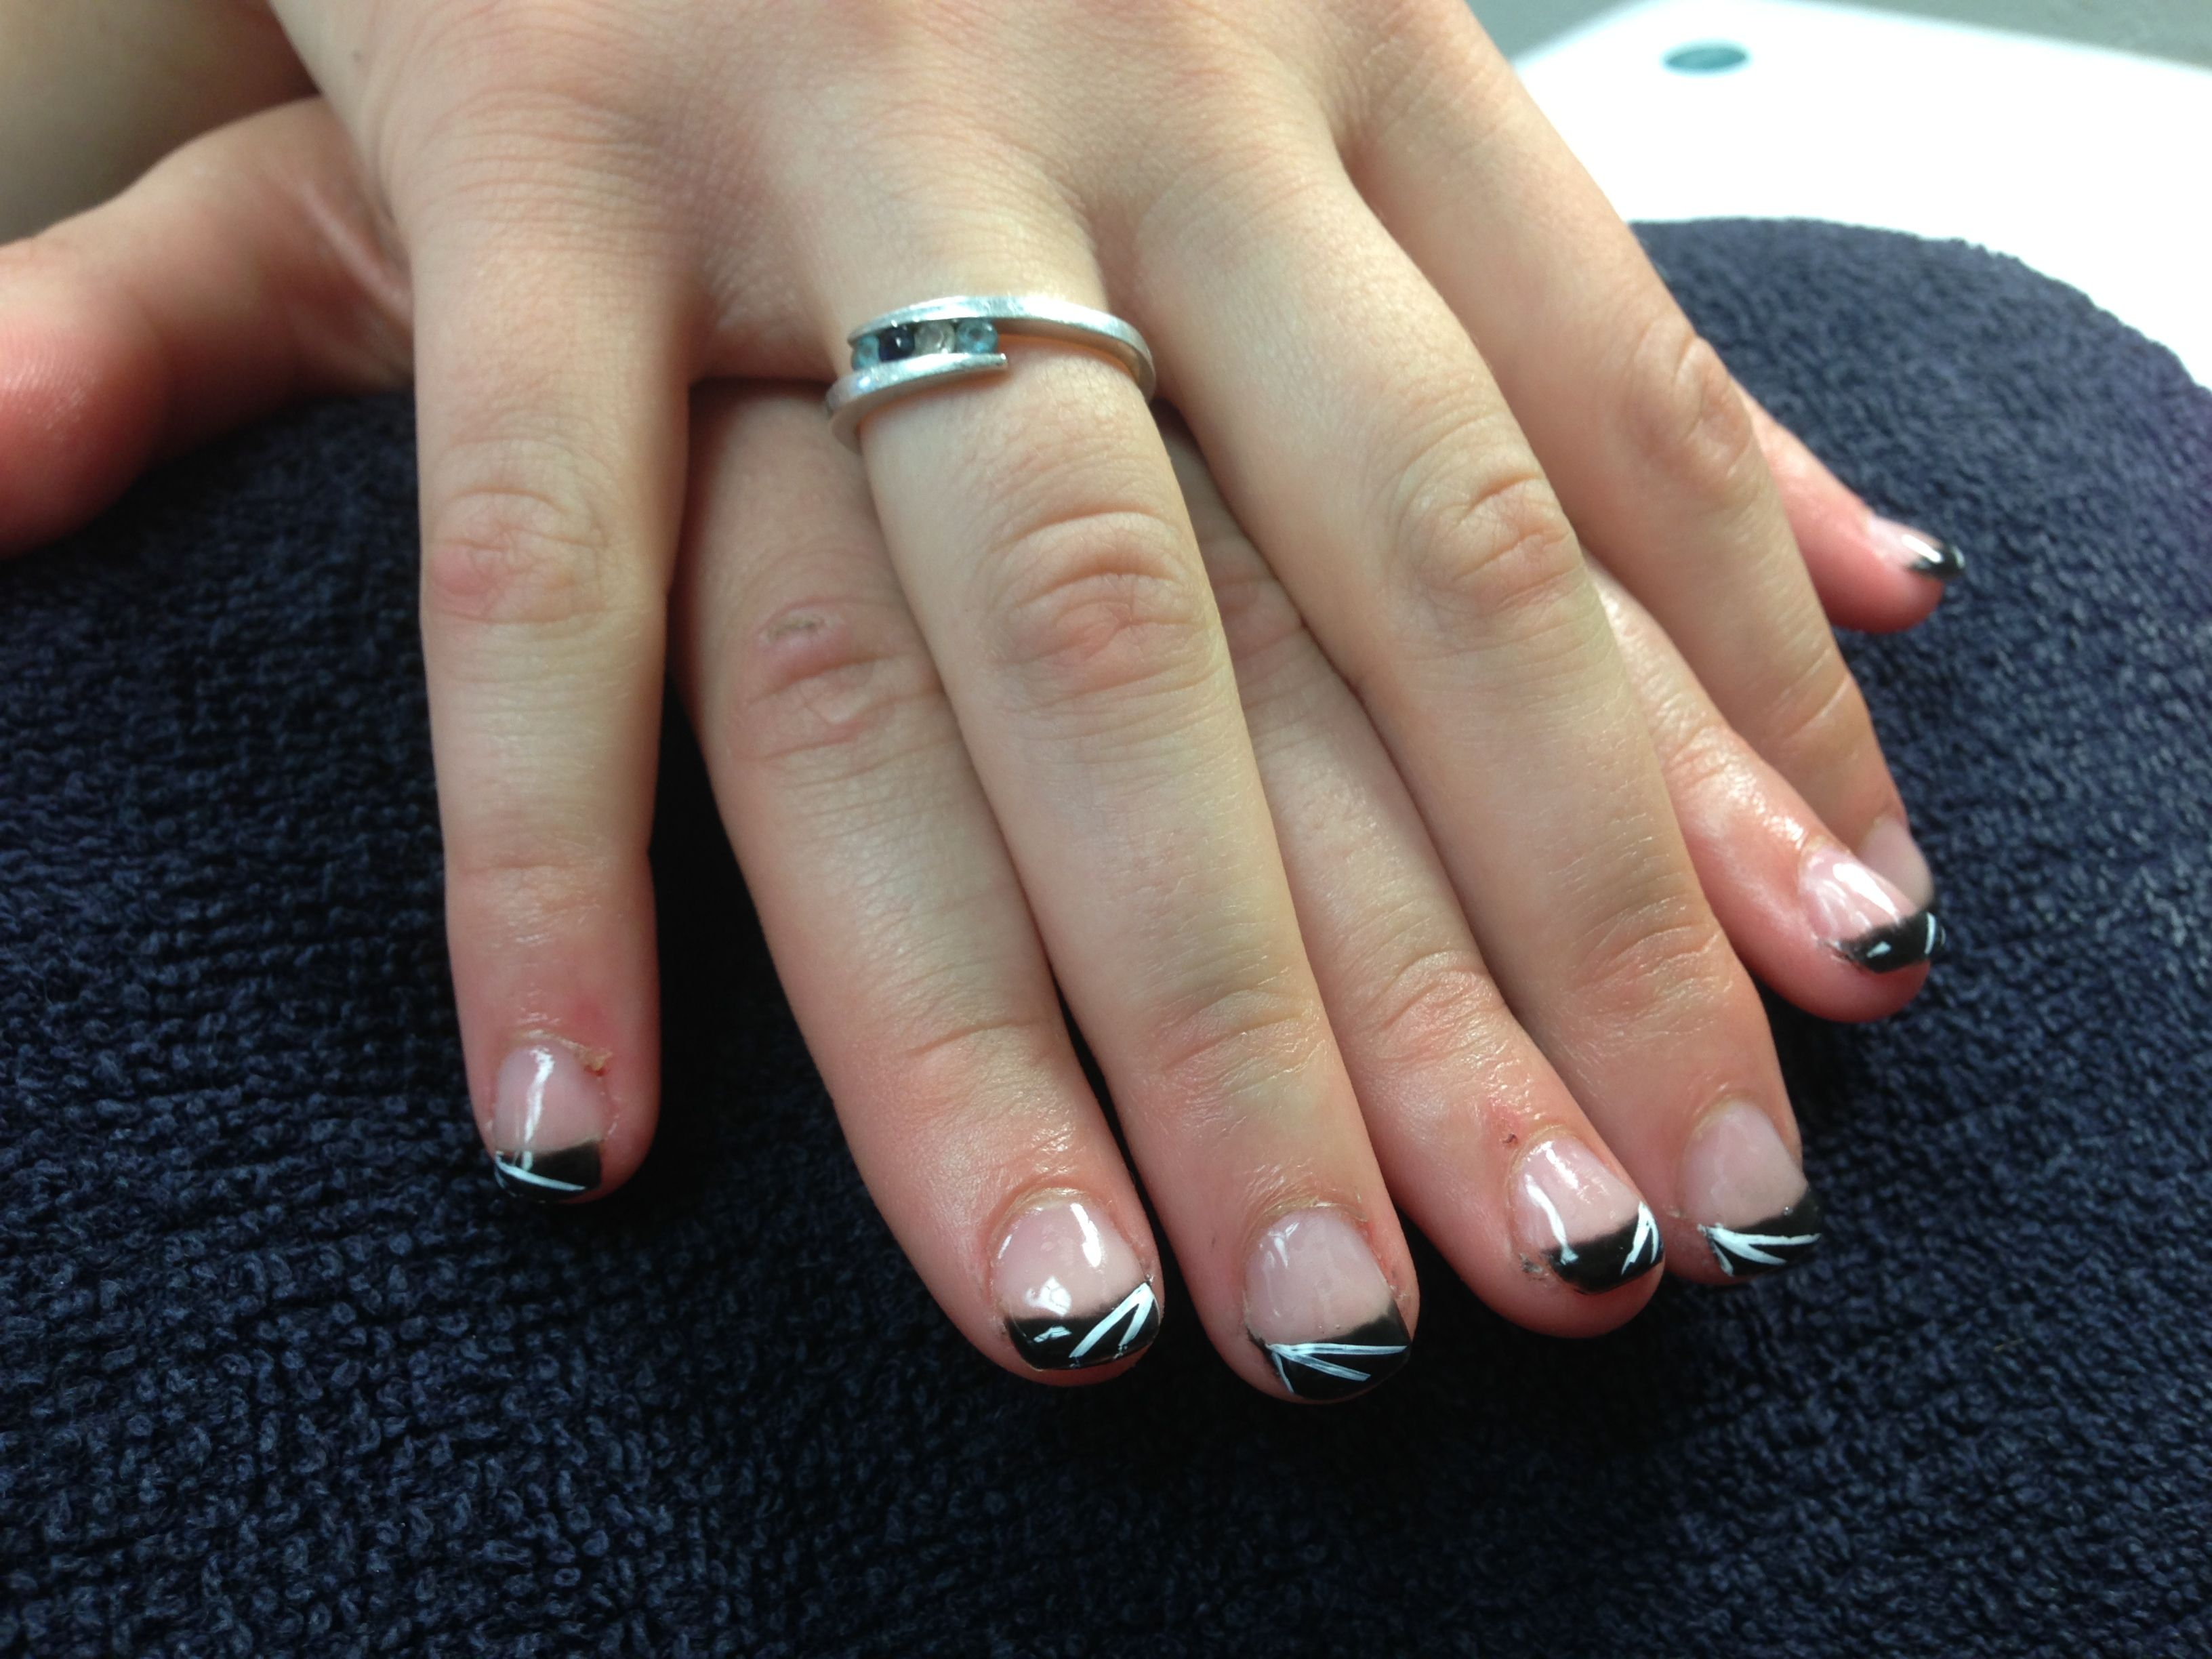 Rain\'s nails. Black tips with white lines. Gel nail art. - Nails I ...